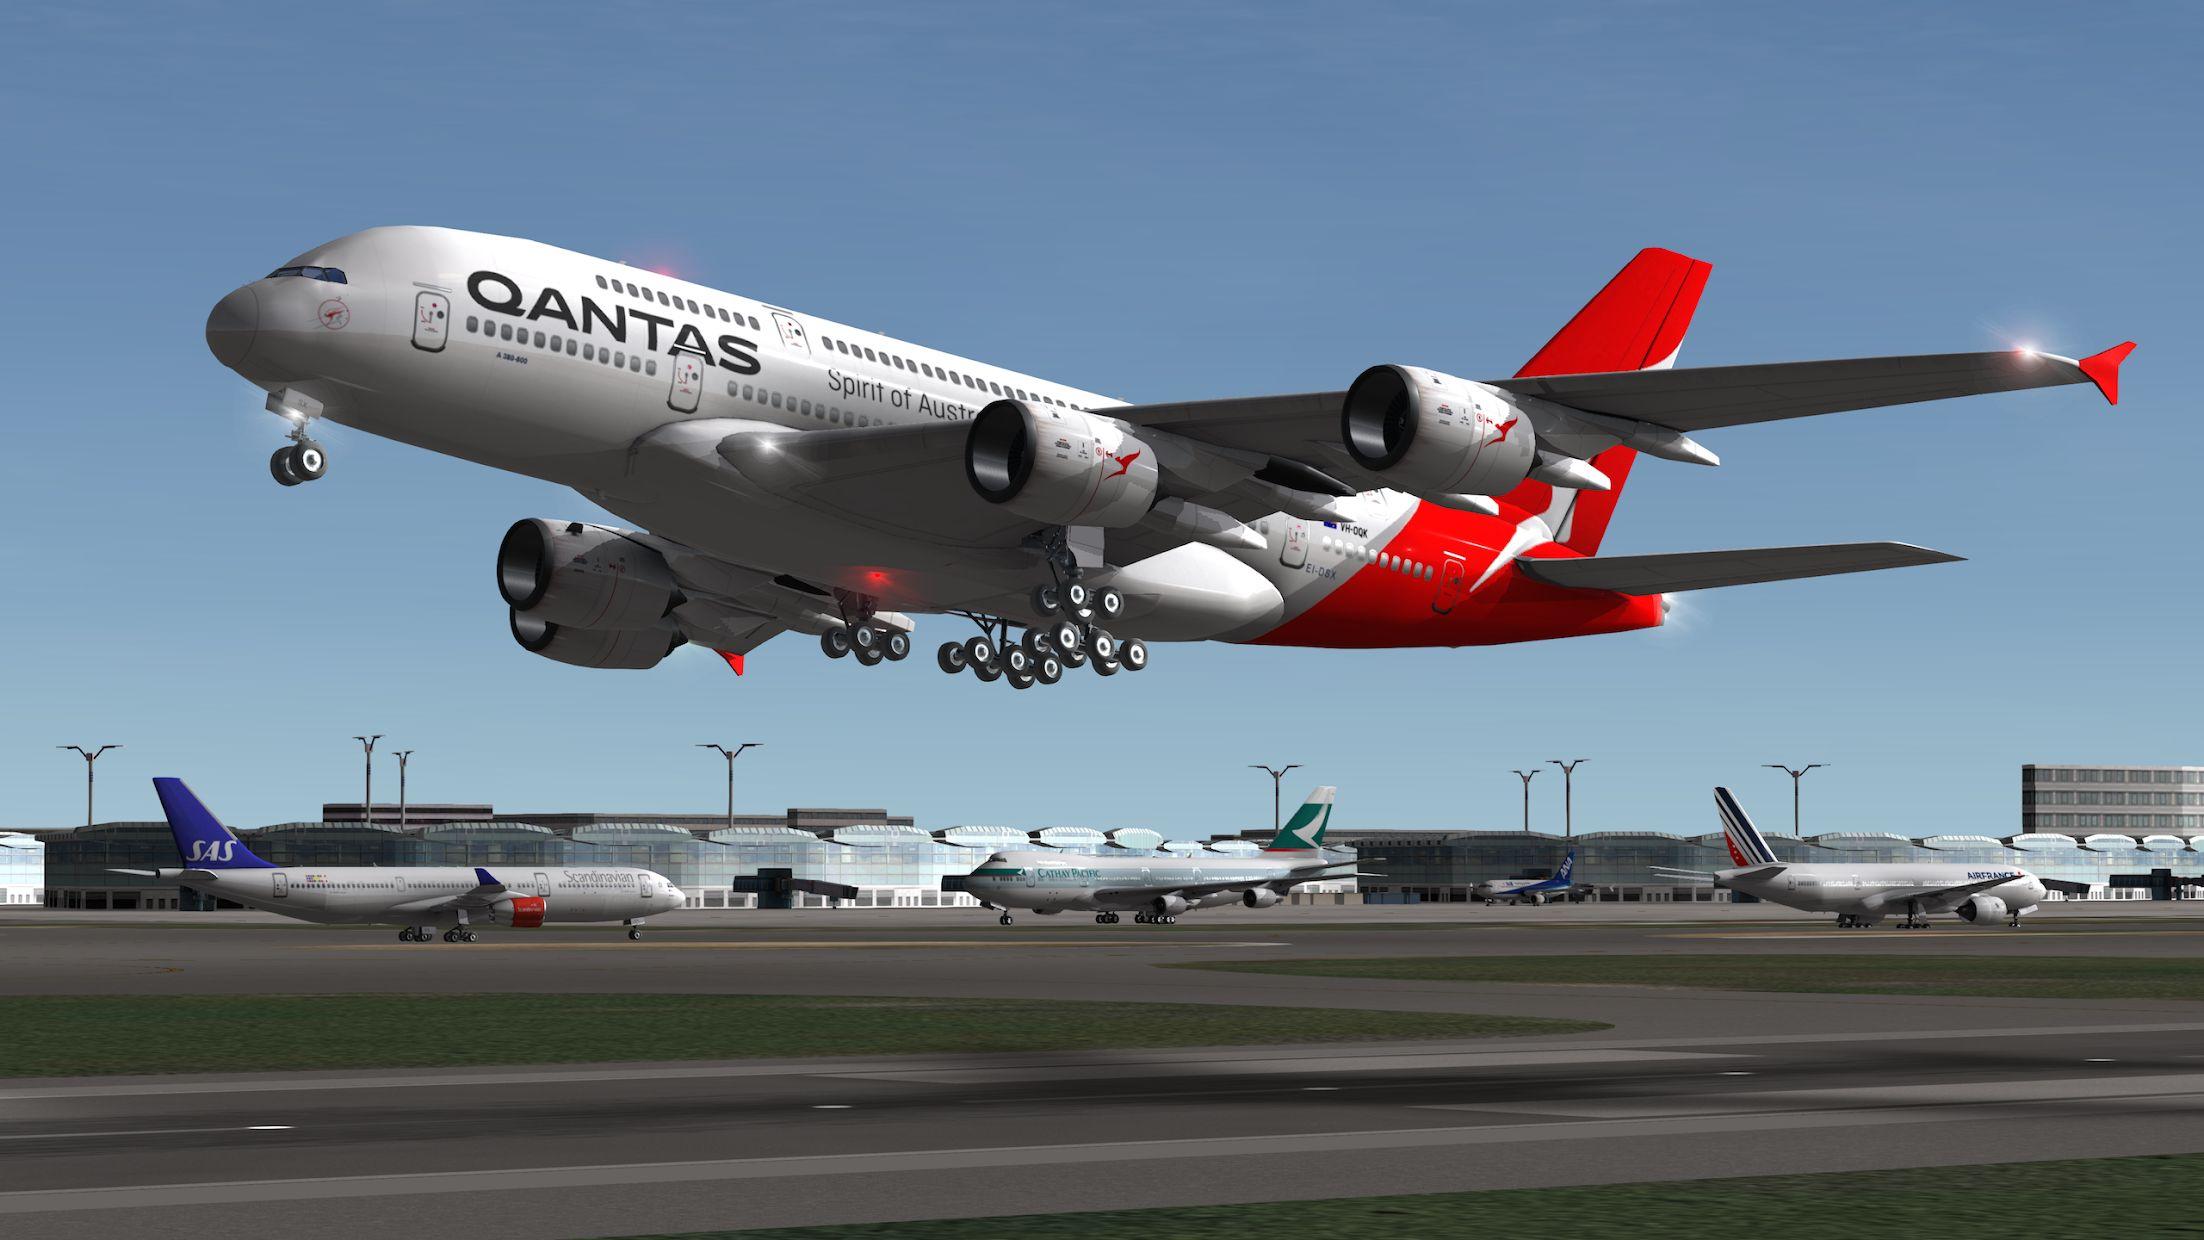 RFS - 真实飞行模拟 游戏截图1